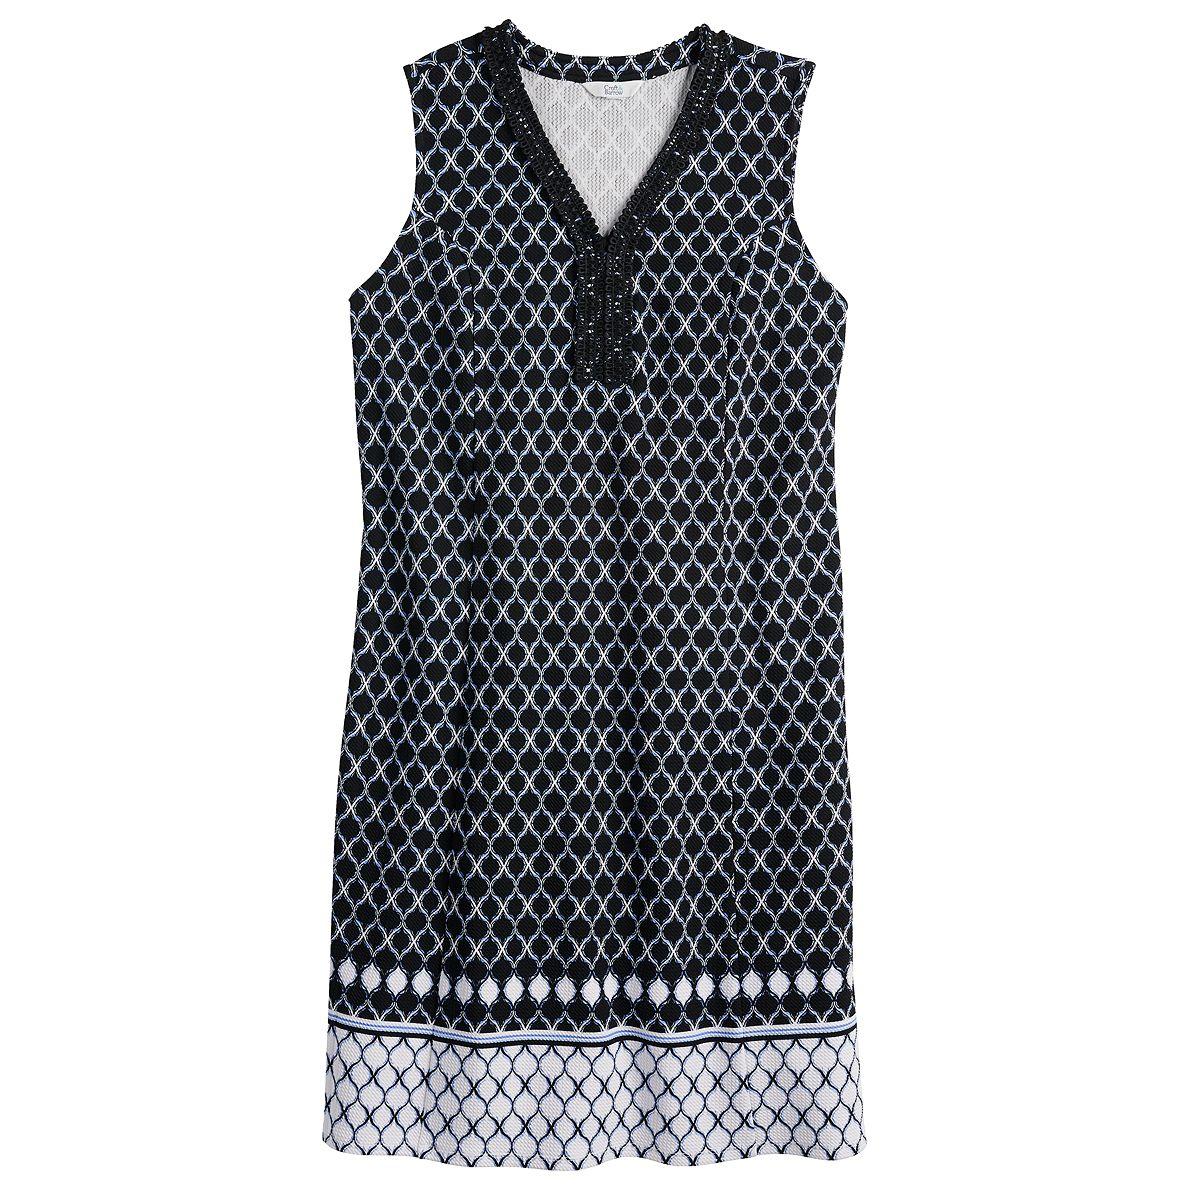 Women's Croft & Barrow® Polished Splitneck Dress Black White Print RTQeL